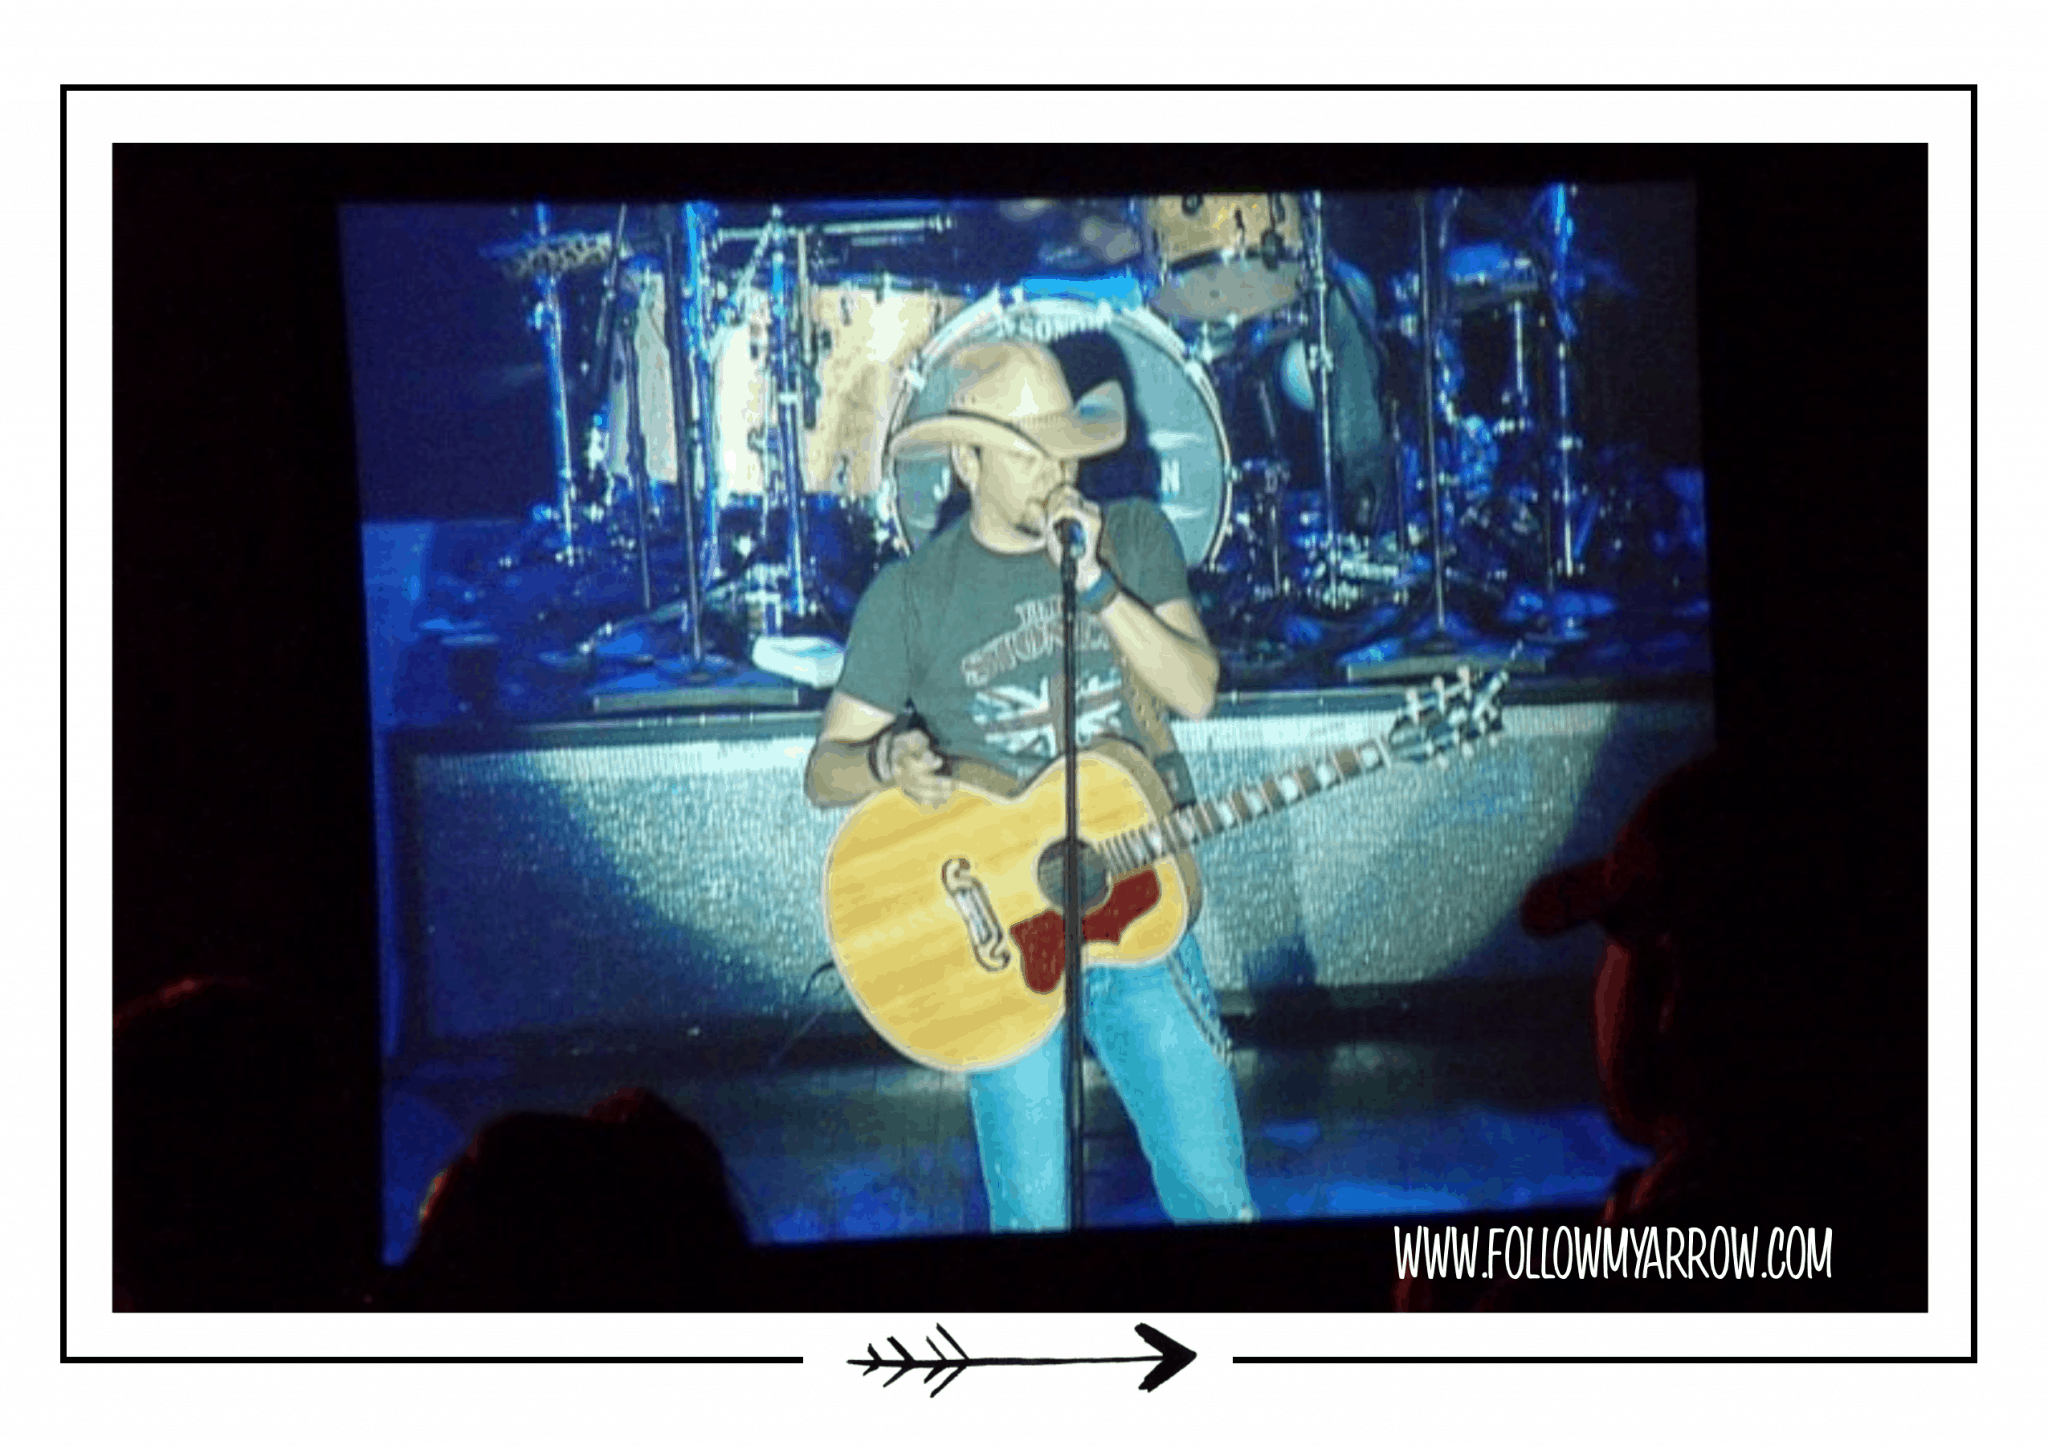 Jason Aldean in 2010 at Soaring Eagle Casino & Resort